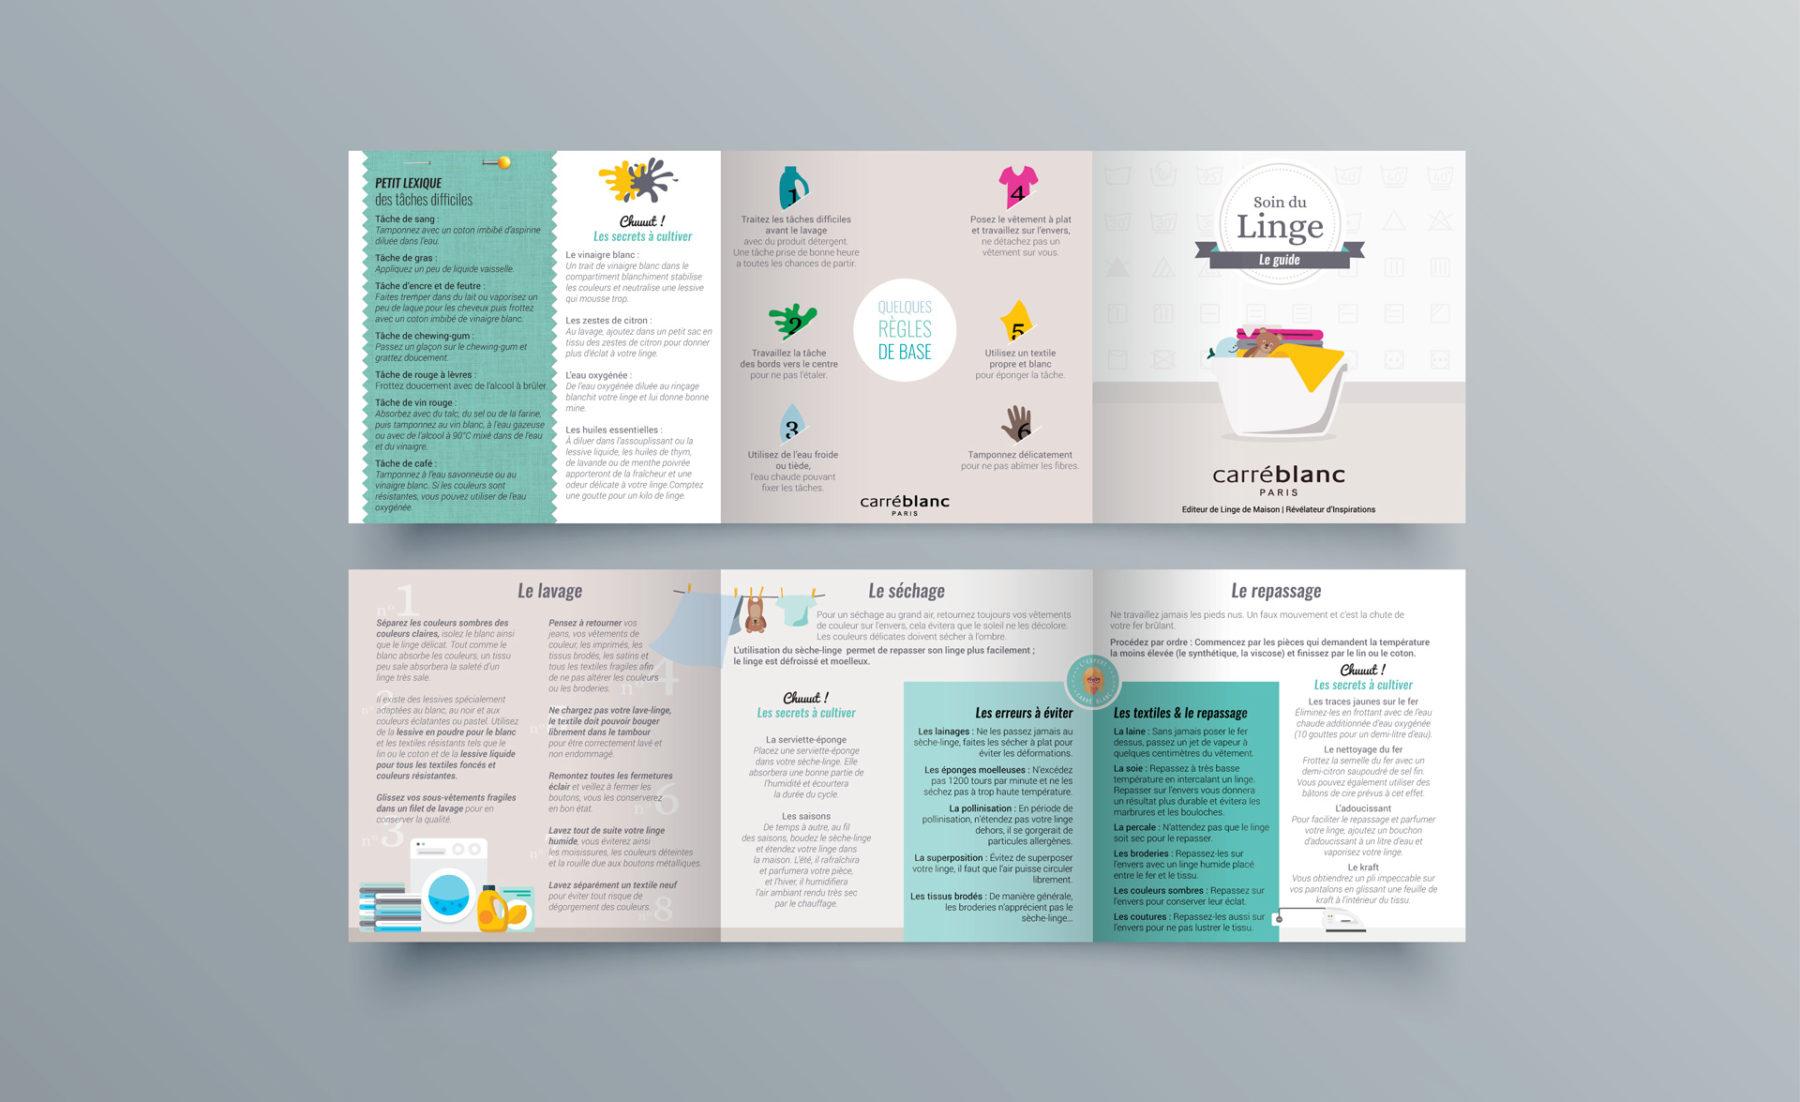 Carré blanc's leaflet designed by MADMINT